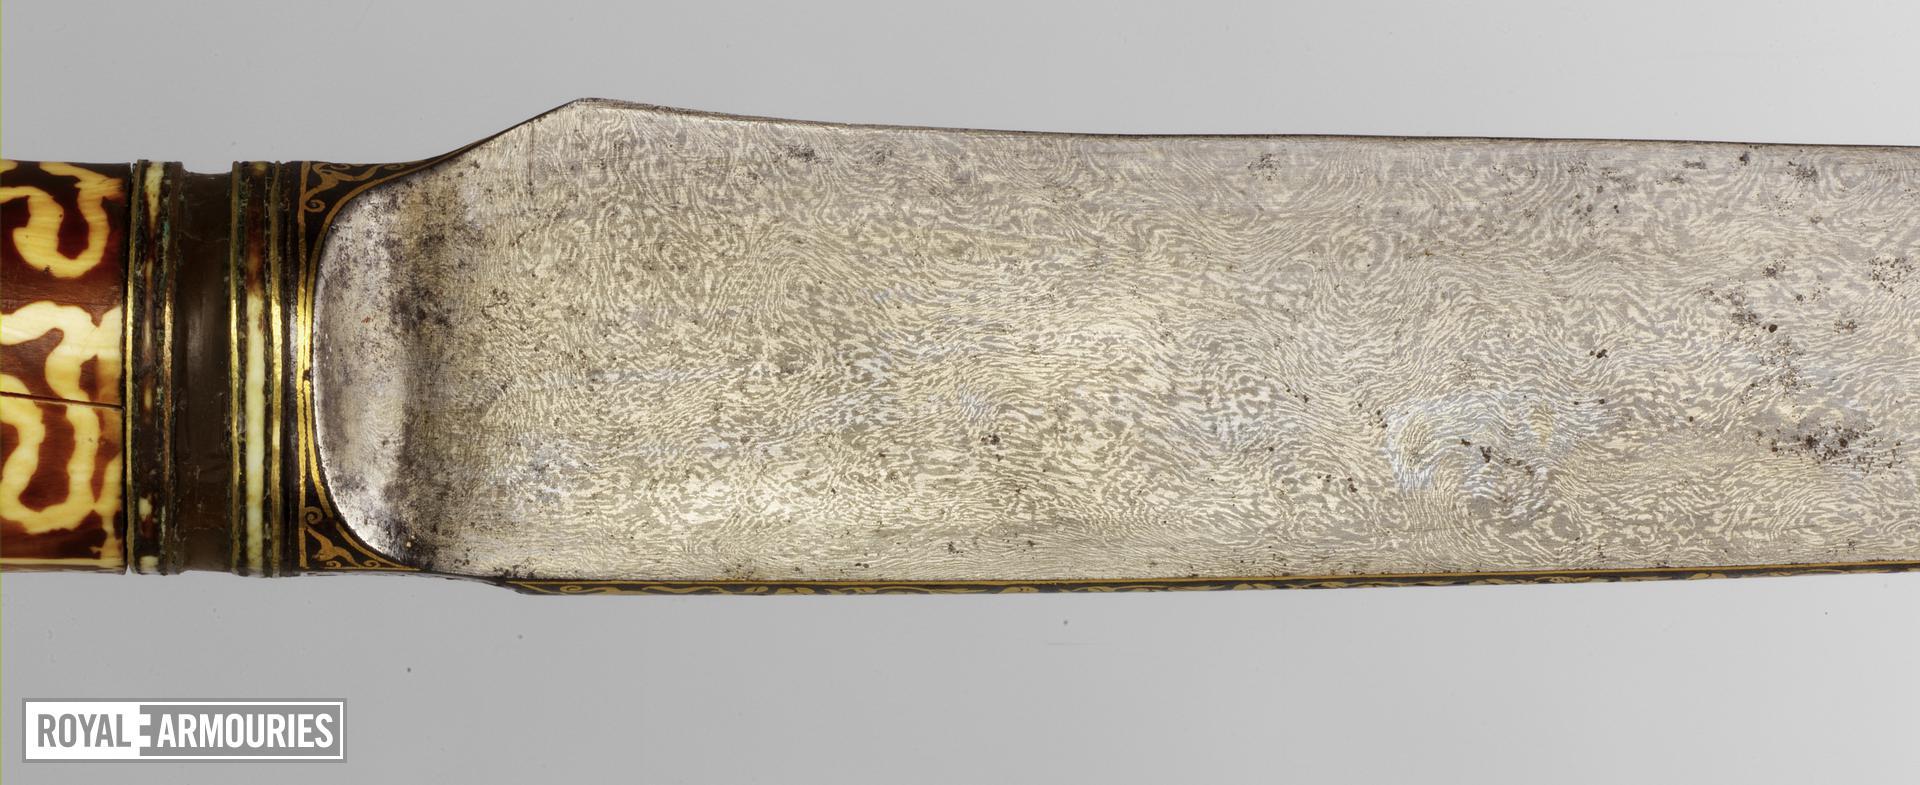 Dagger (kard) By Muhammad Baqir.